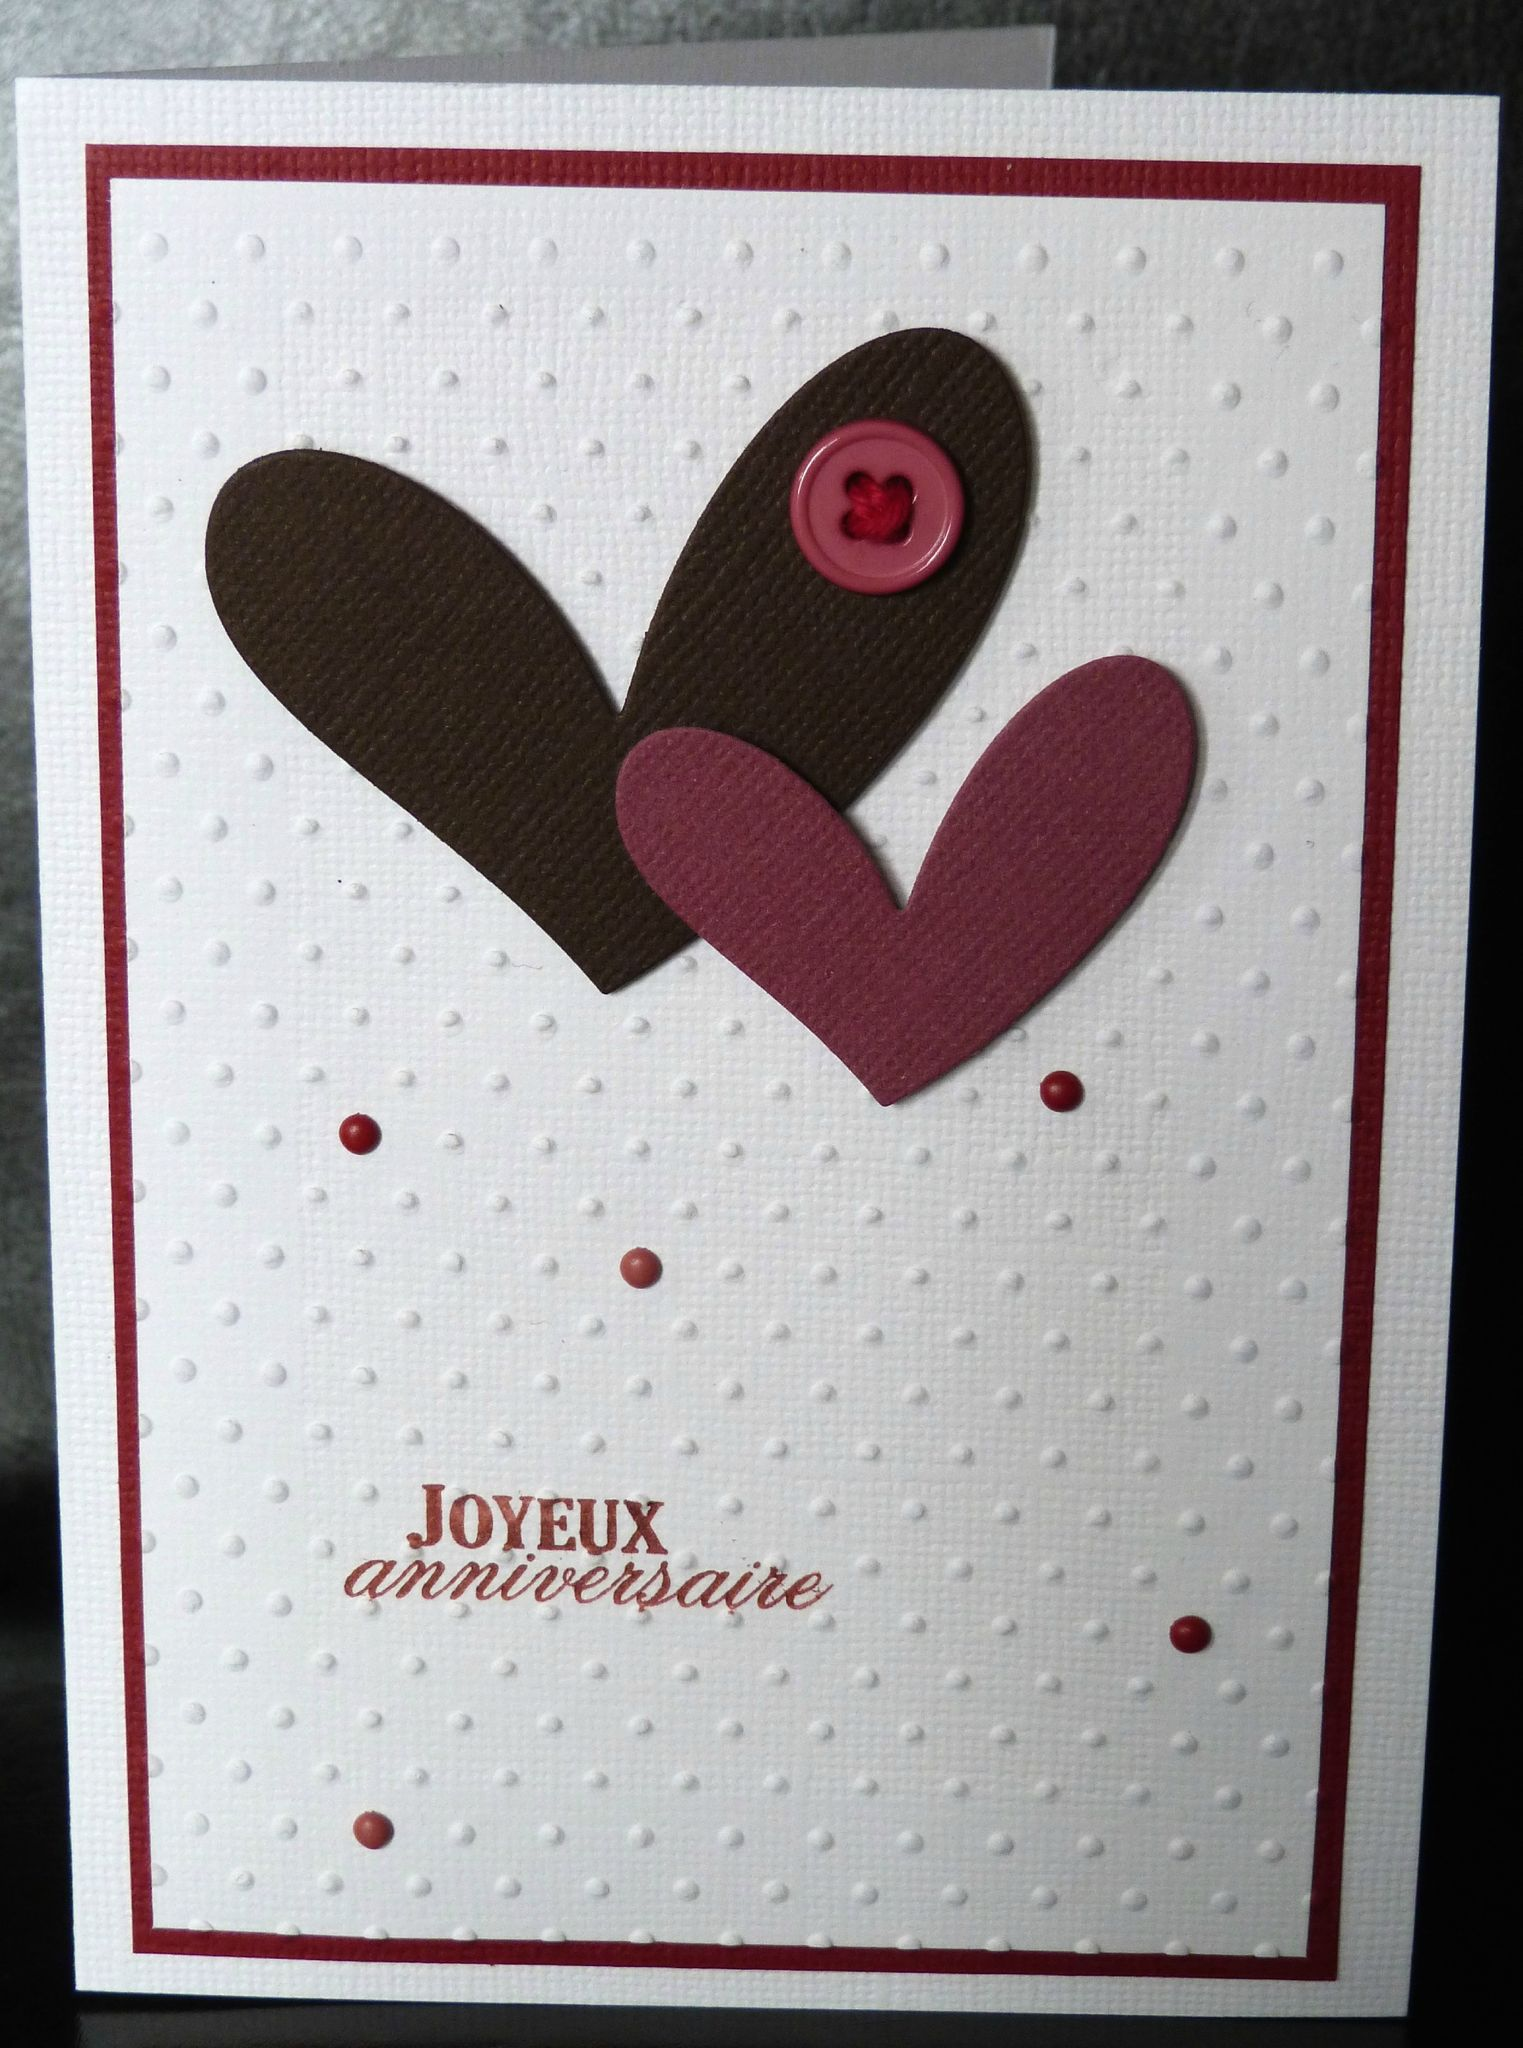 08. blanc, chocolat, violine et rouge - 2 coeurs